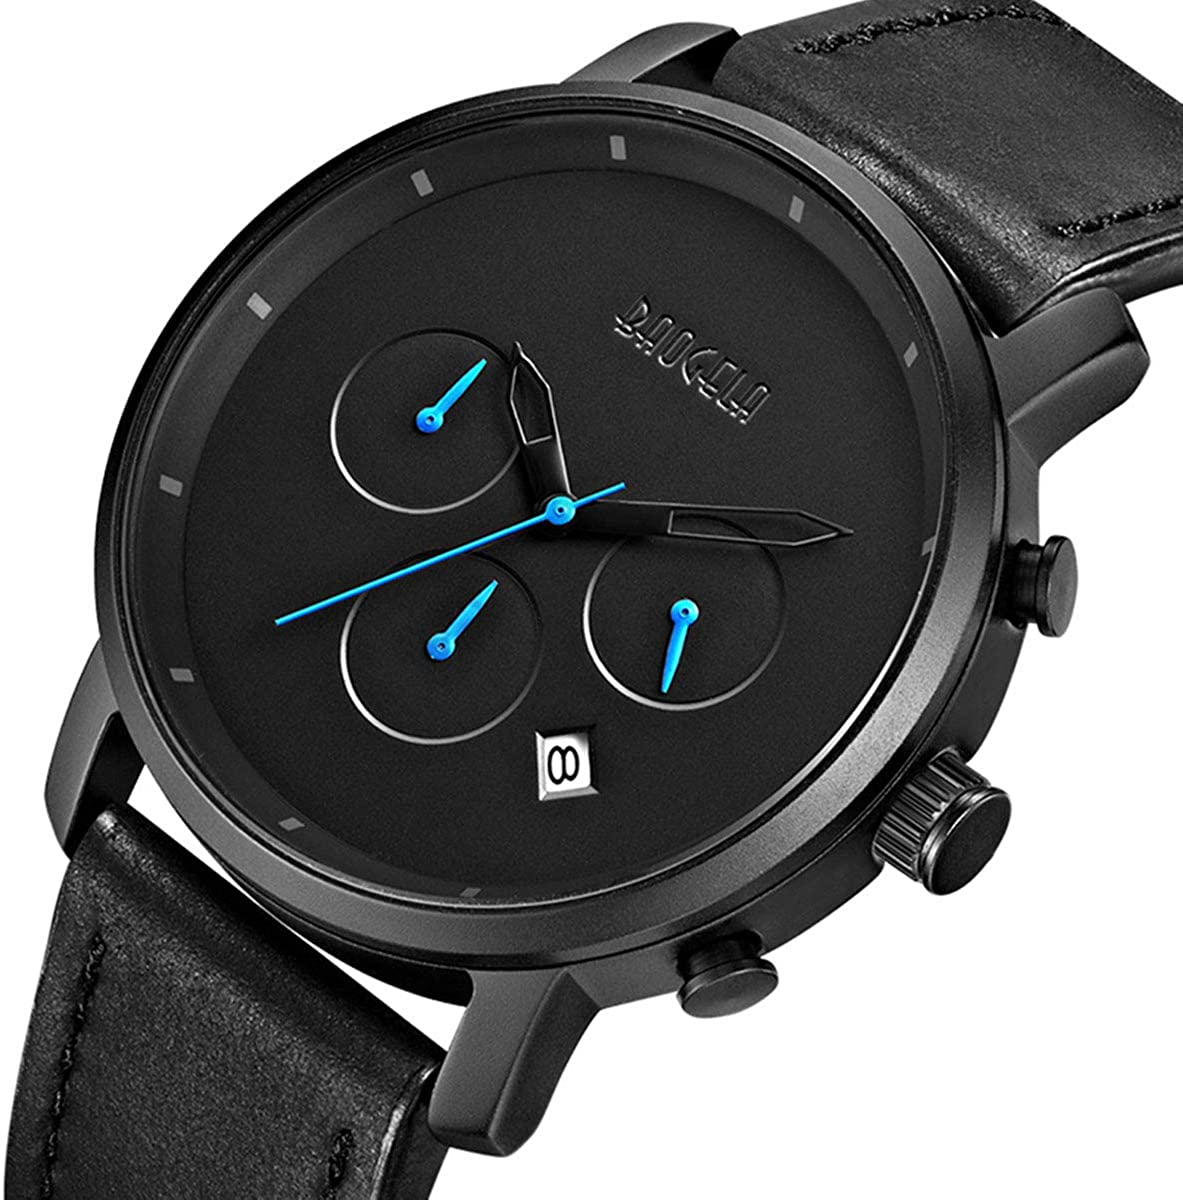 BAOGELA Men s Sports Chronograph Analog Quartz Watches Black Leather Band Waterproof Wristwatch Man